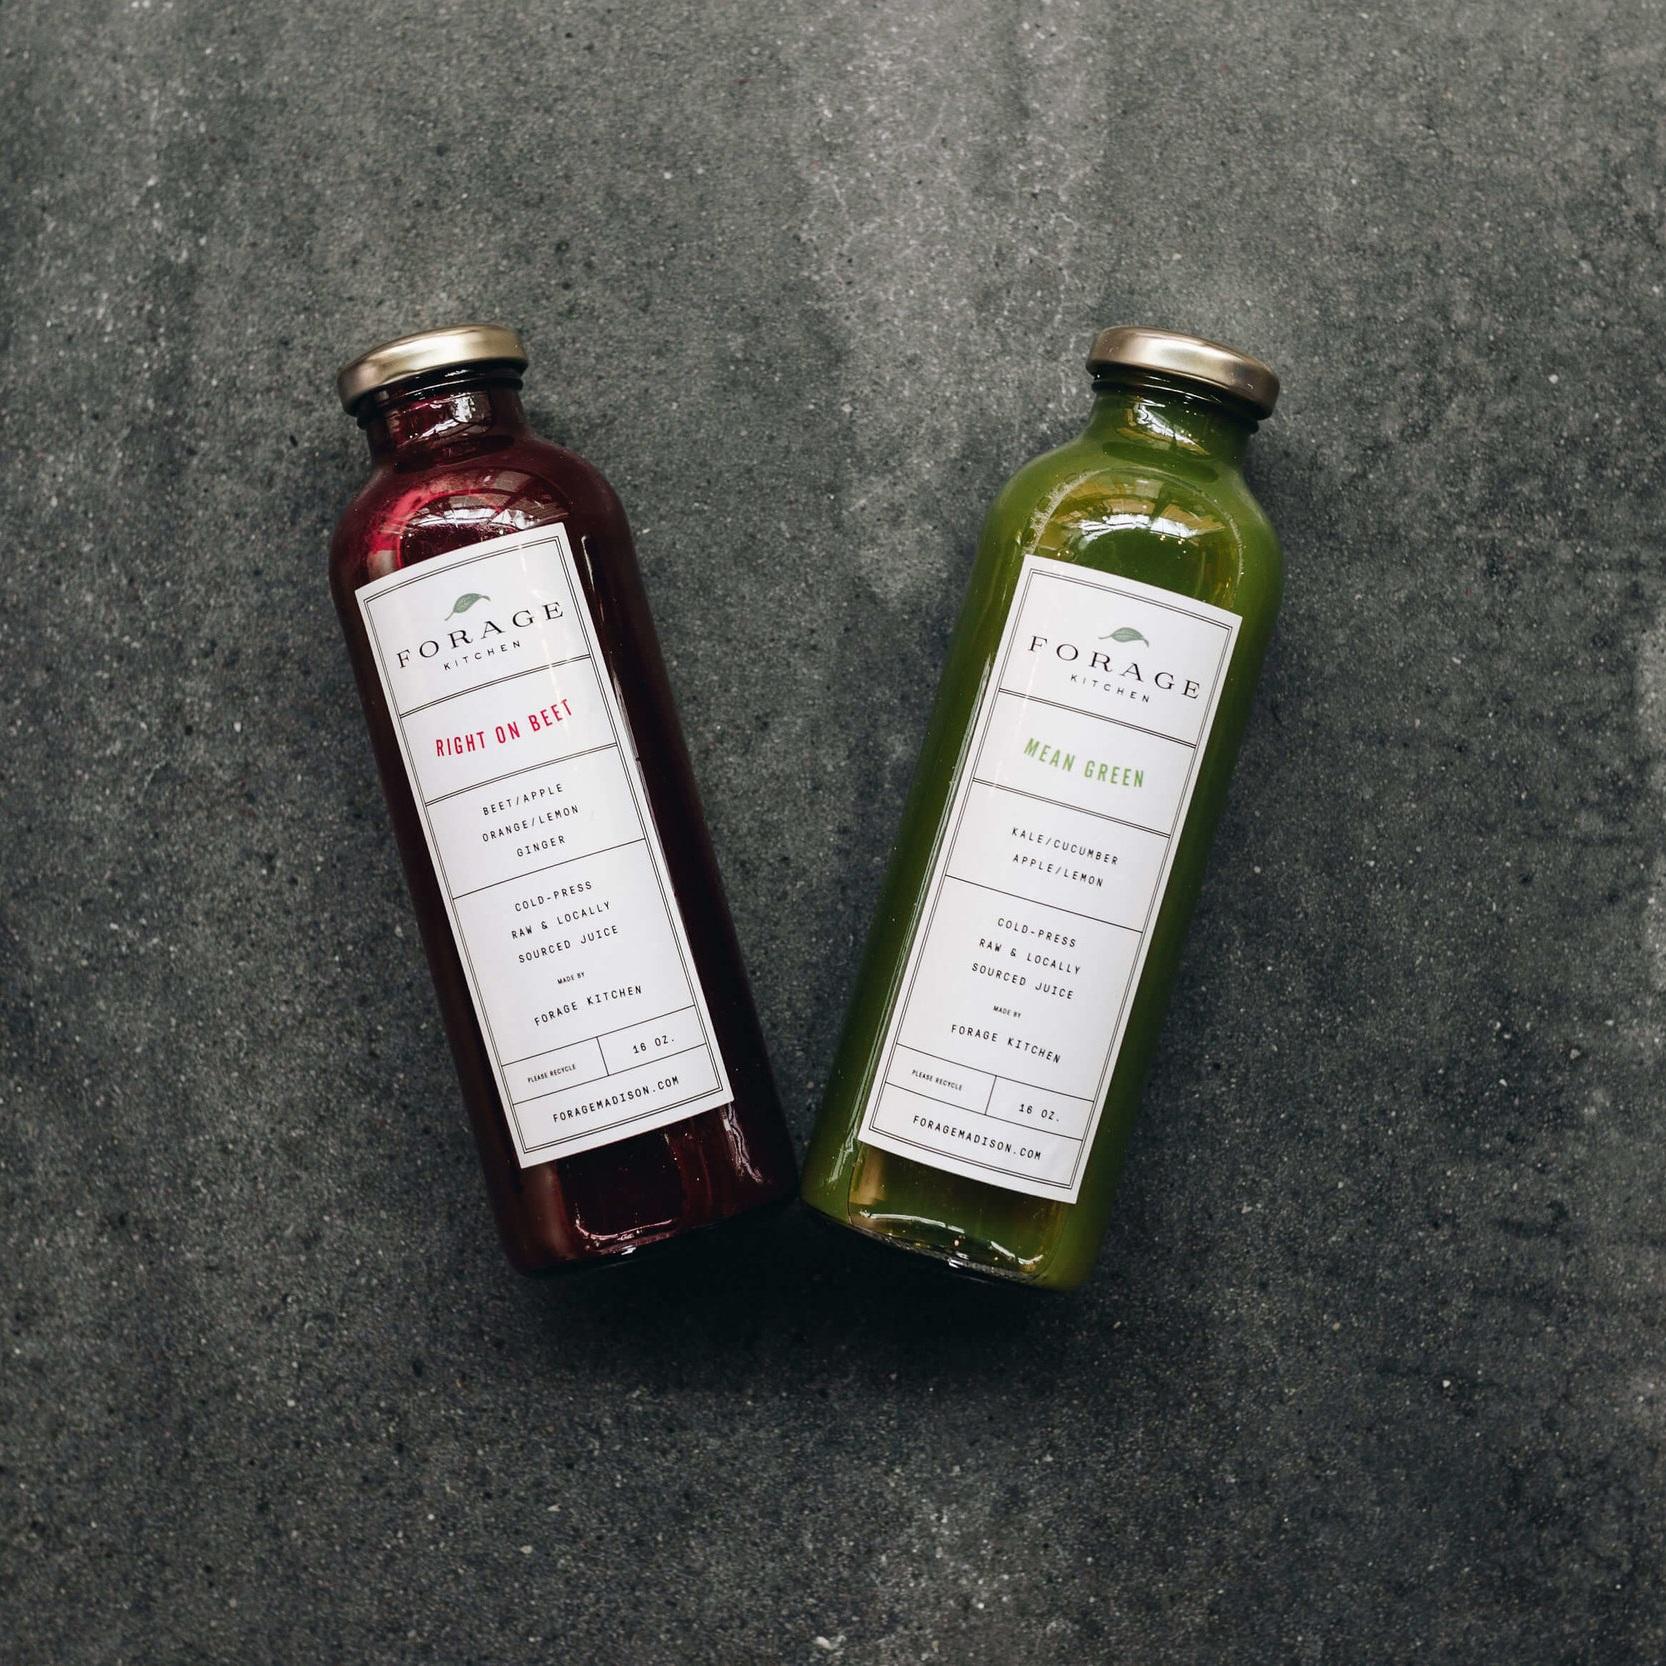 LEAN MEAN AND GREEN - Cucumber, kale, apple, lemon6